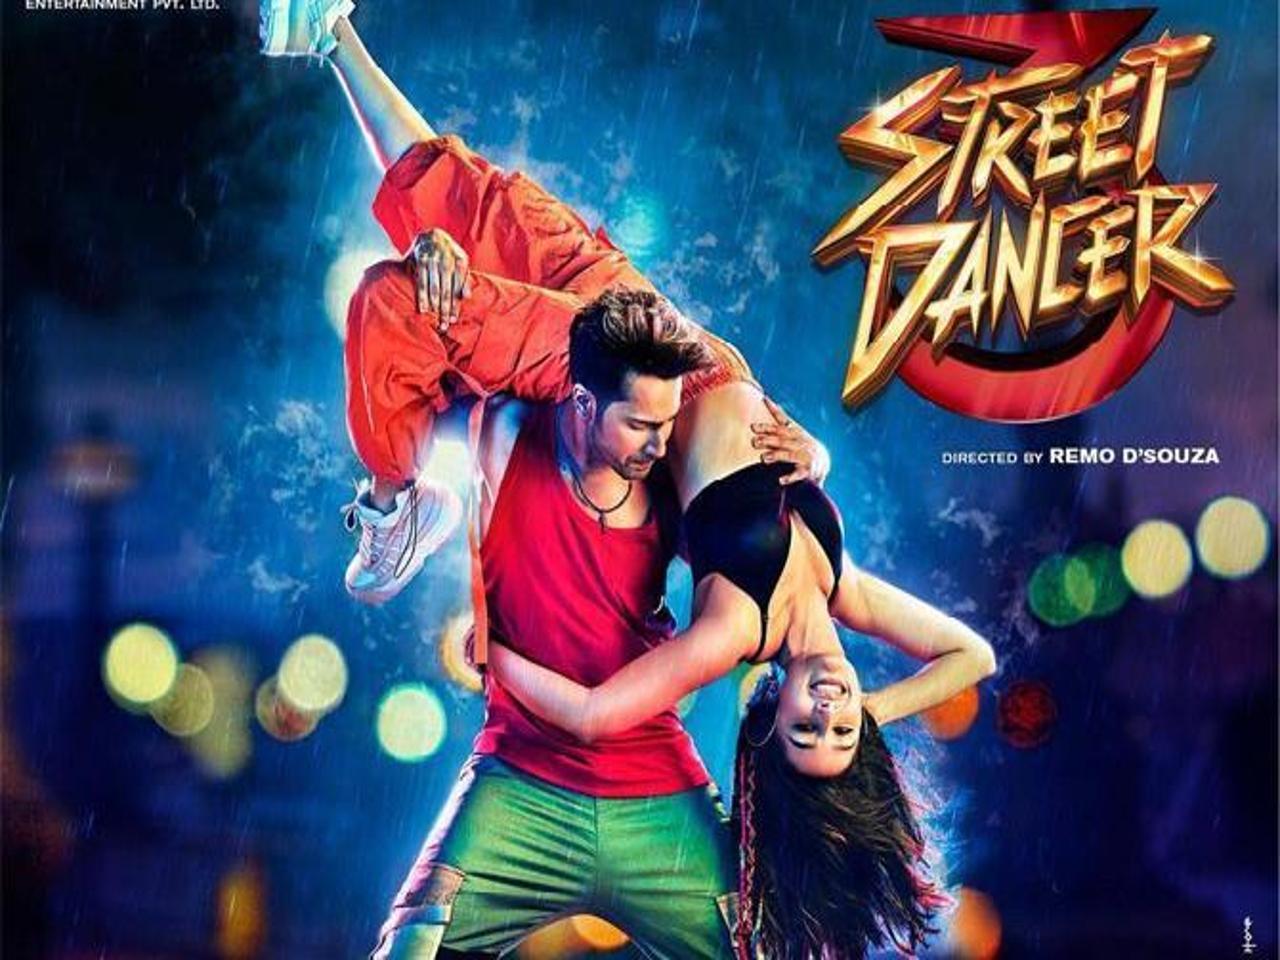 Street Dancer 3D Full Movie Download